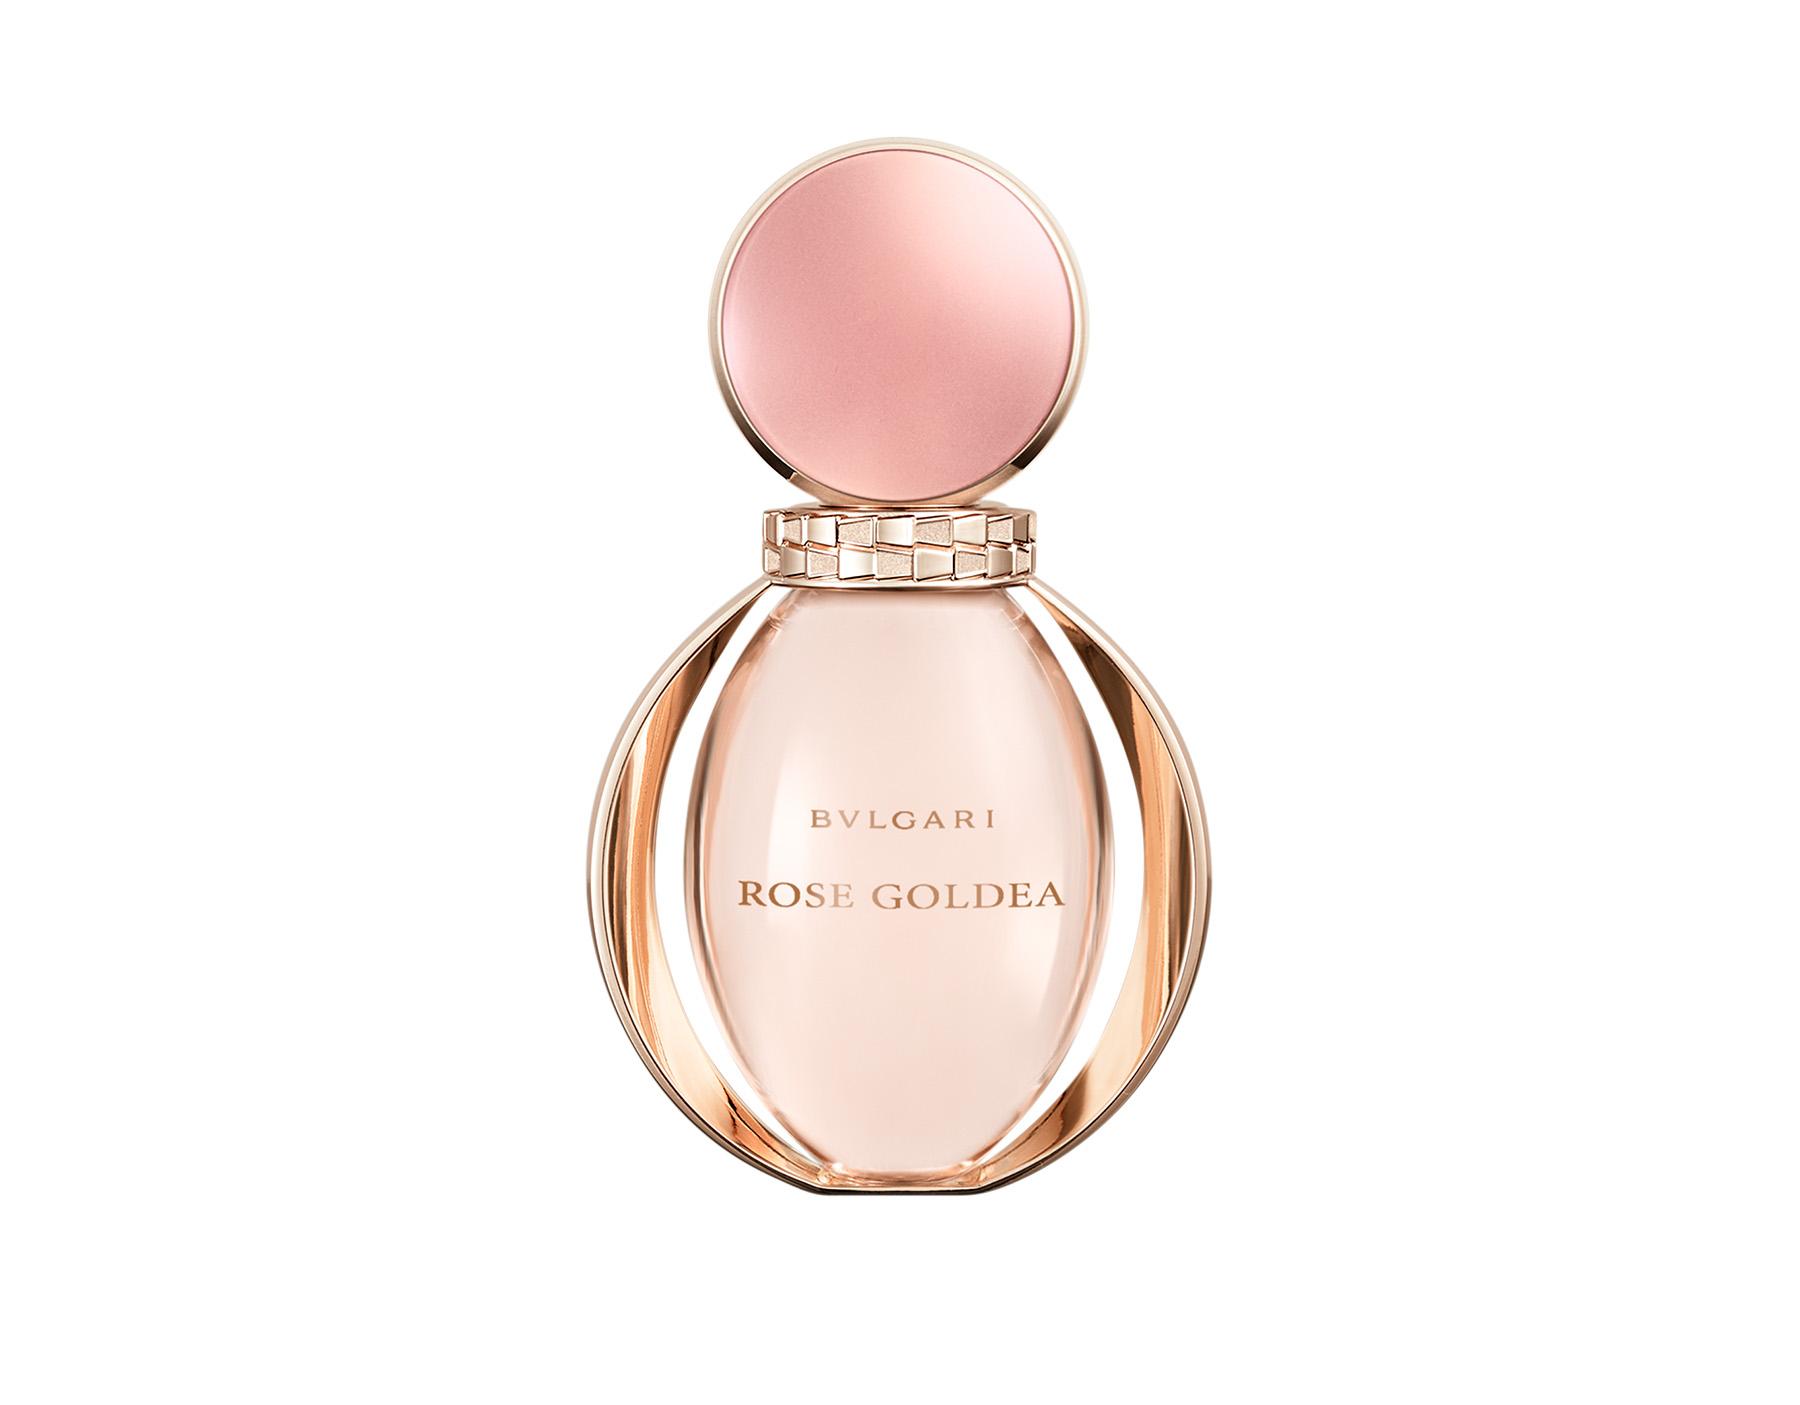 Bvlgari | Bvlgari Rose Goldea Eau de Parfum 50ml